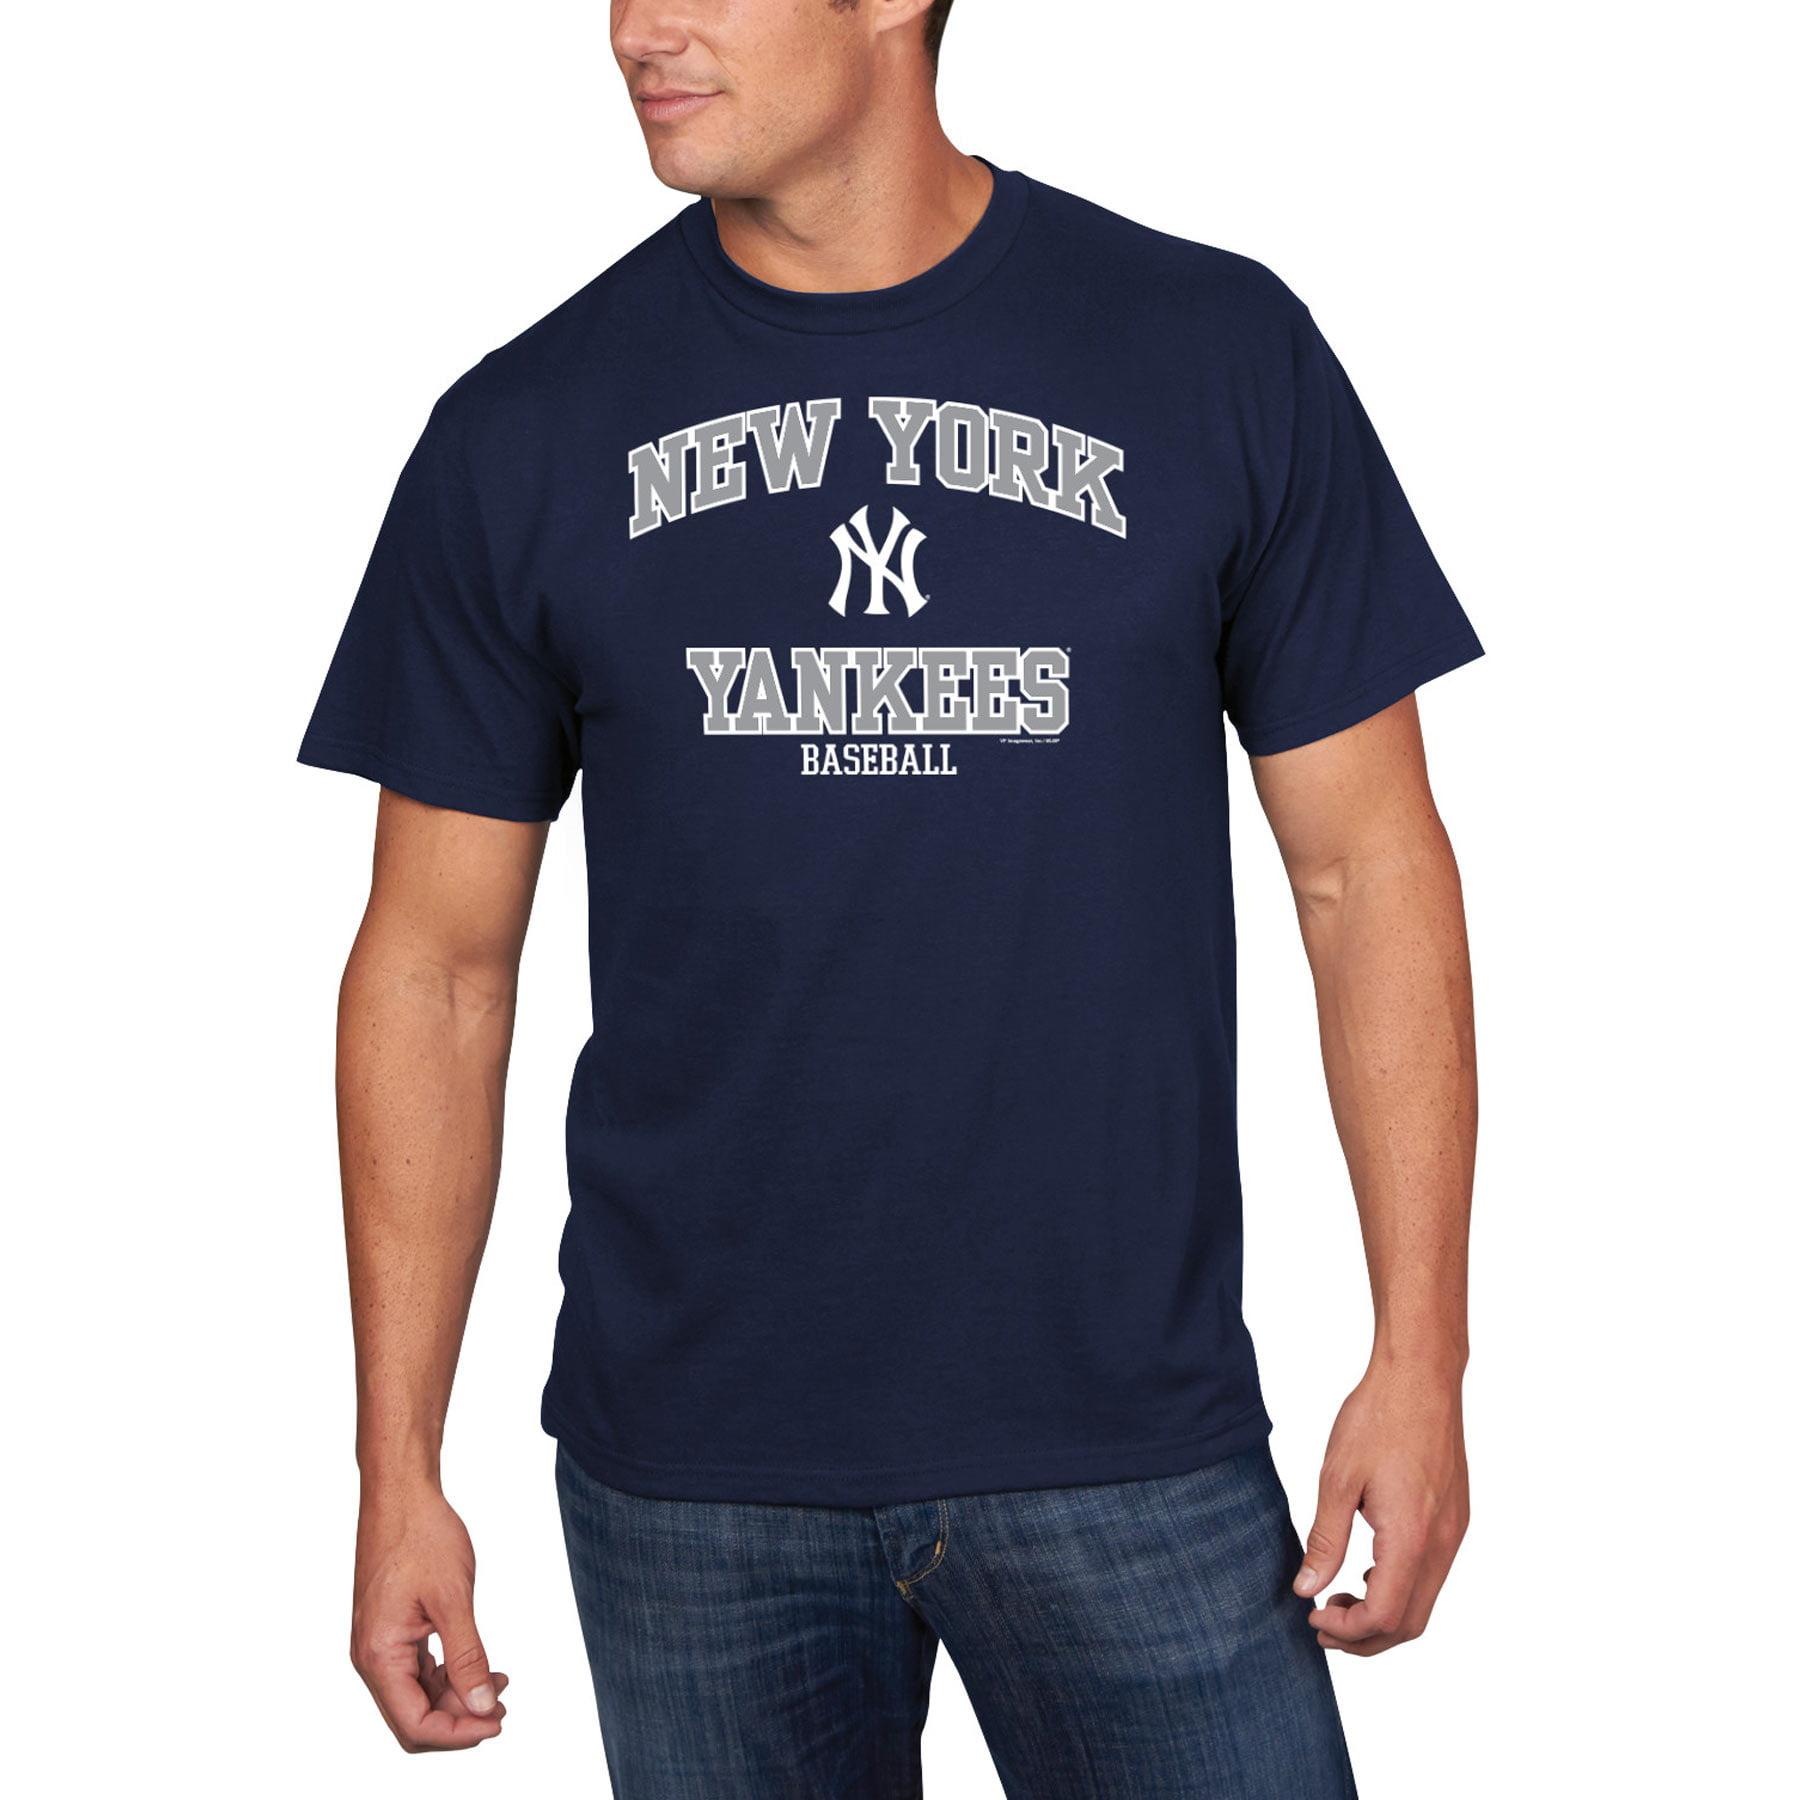 Men's Majestic Navy New York Yankees High Praise T-Shirt